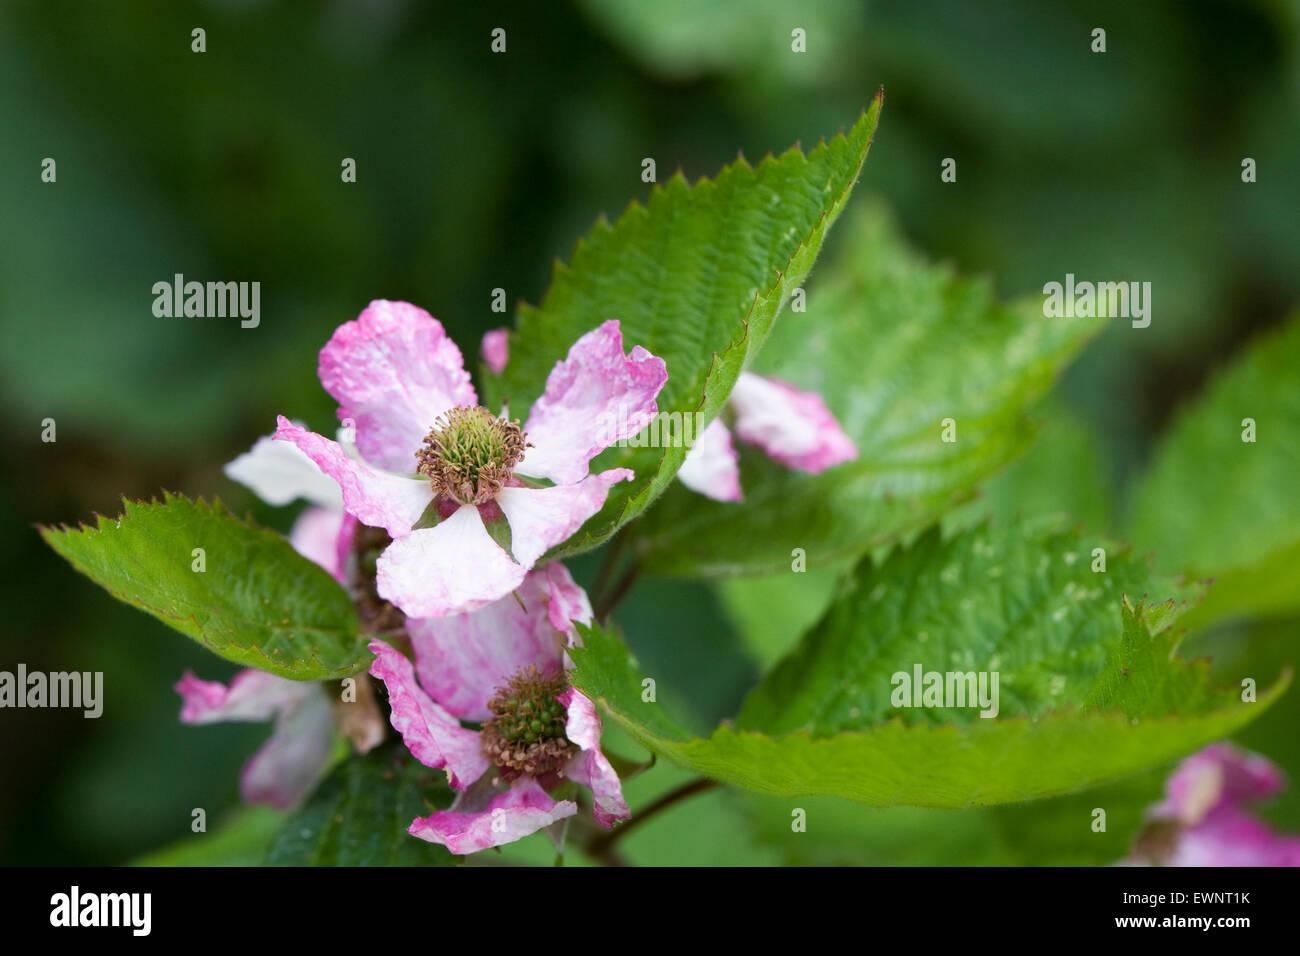 Rubus fructicosus. Pollinated blackberry flower. - Stock Image